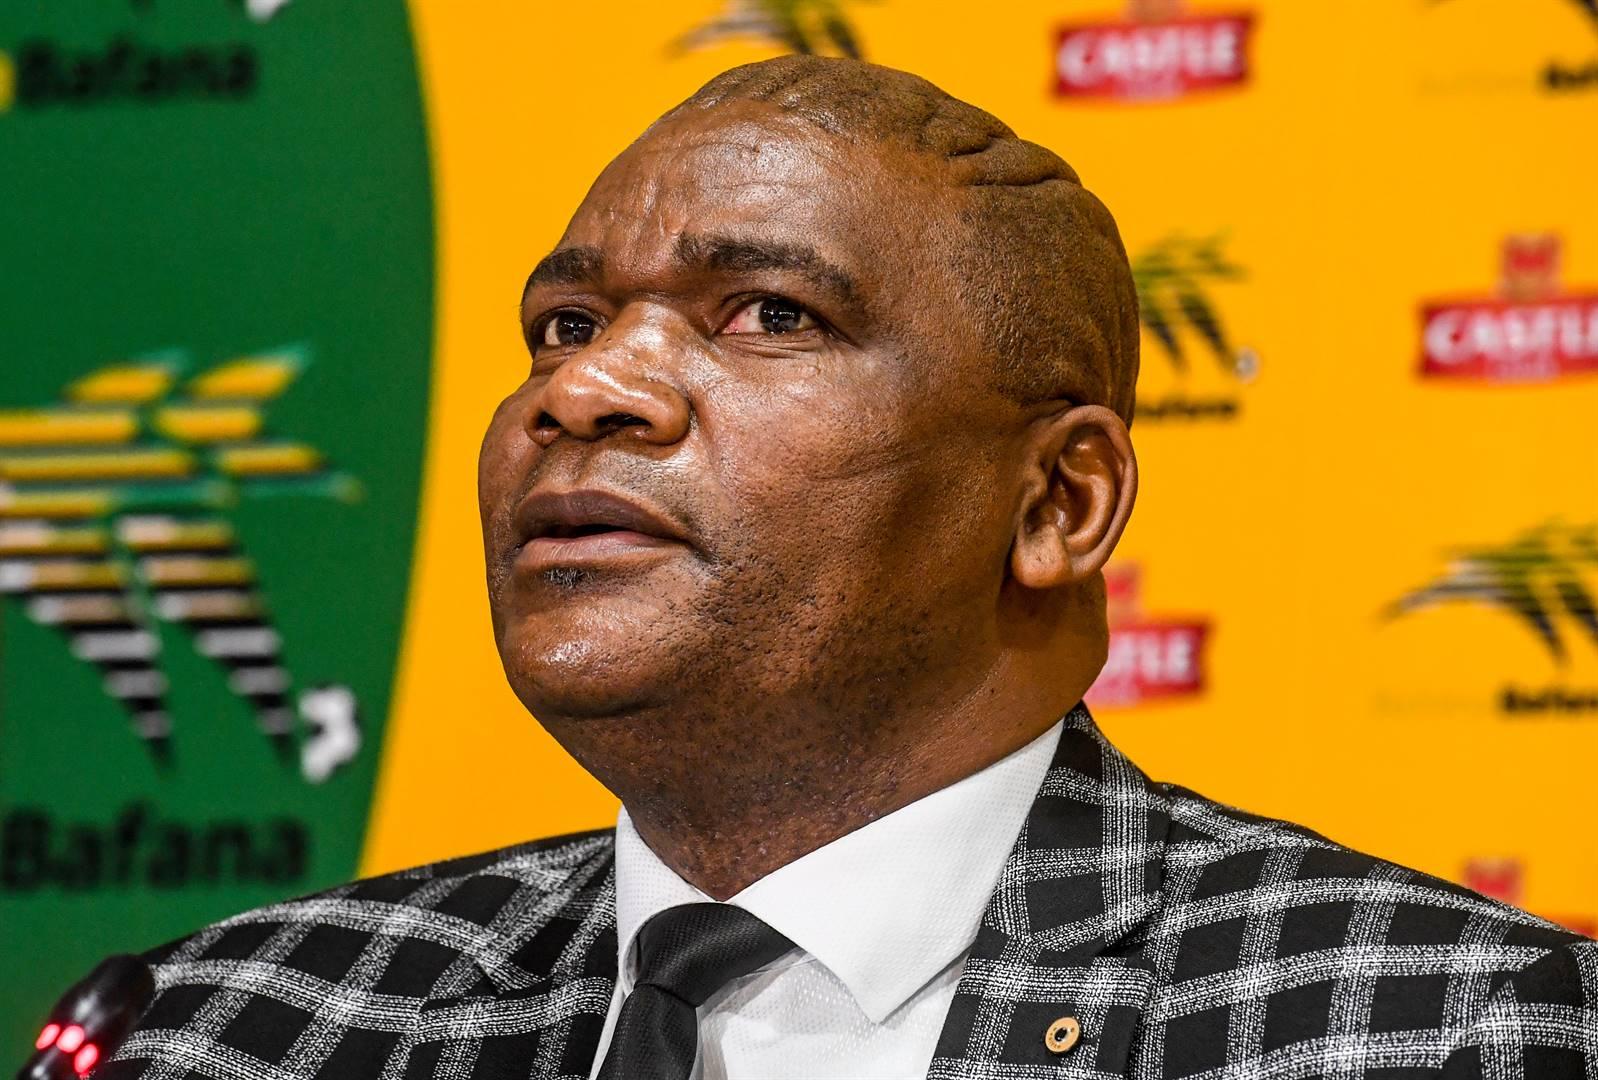 Bafana coach Molefi Ntseki during the squad announcement at Safa House on Friday. Picture: Sydney Seshibedi / Gallo Images